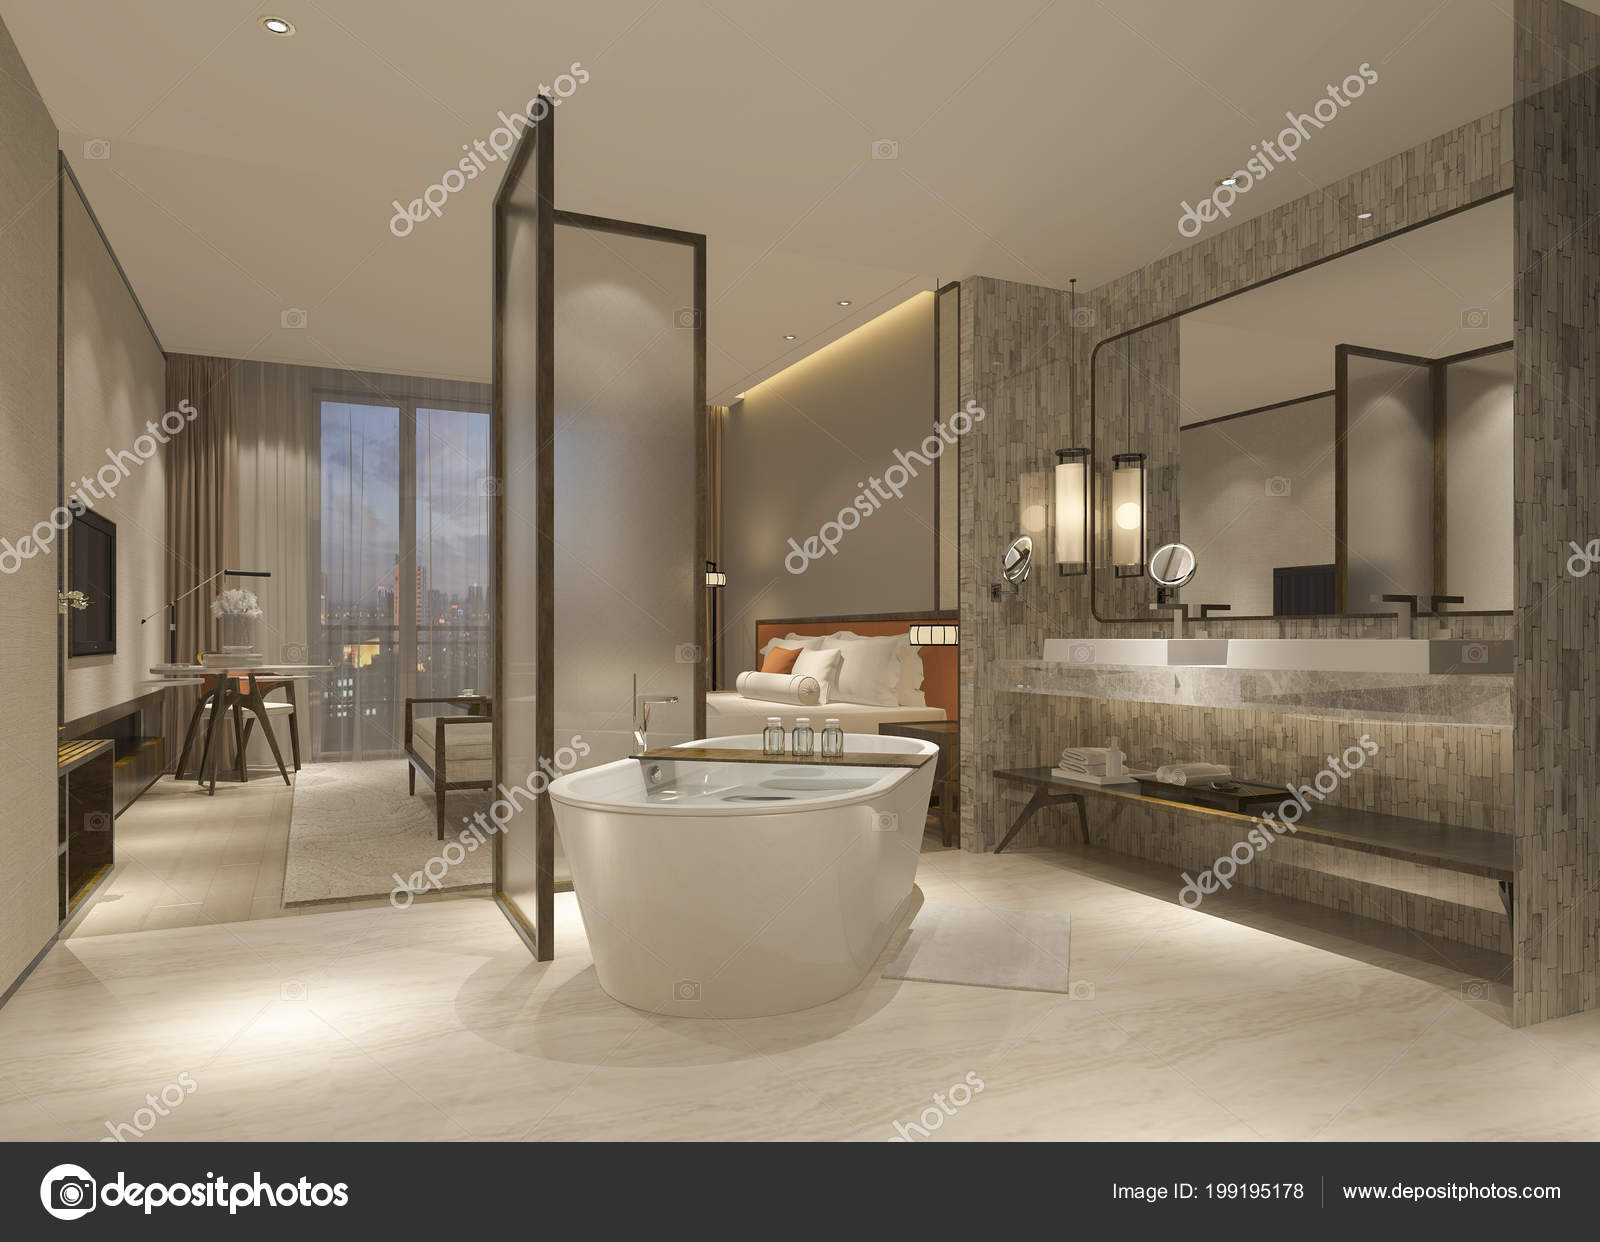 Salle Bain Suite Chambre Coucher Luxe Moderne Rendu ...